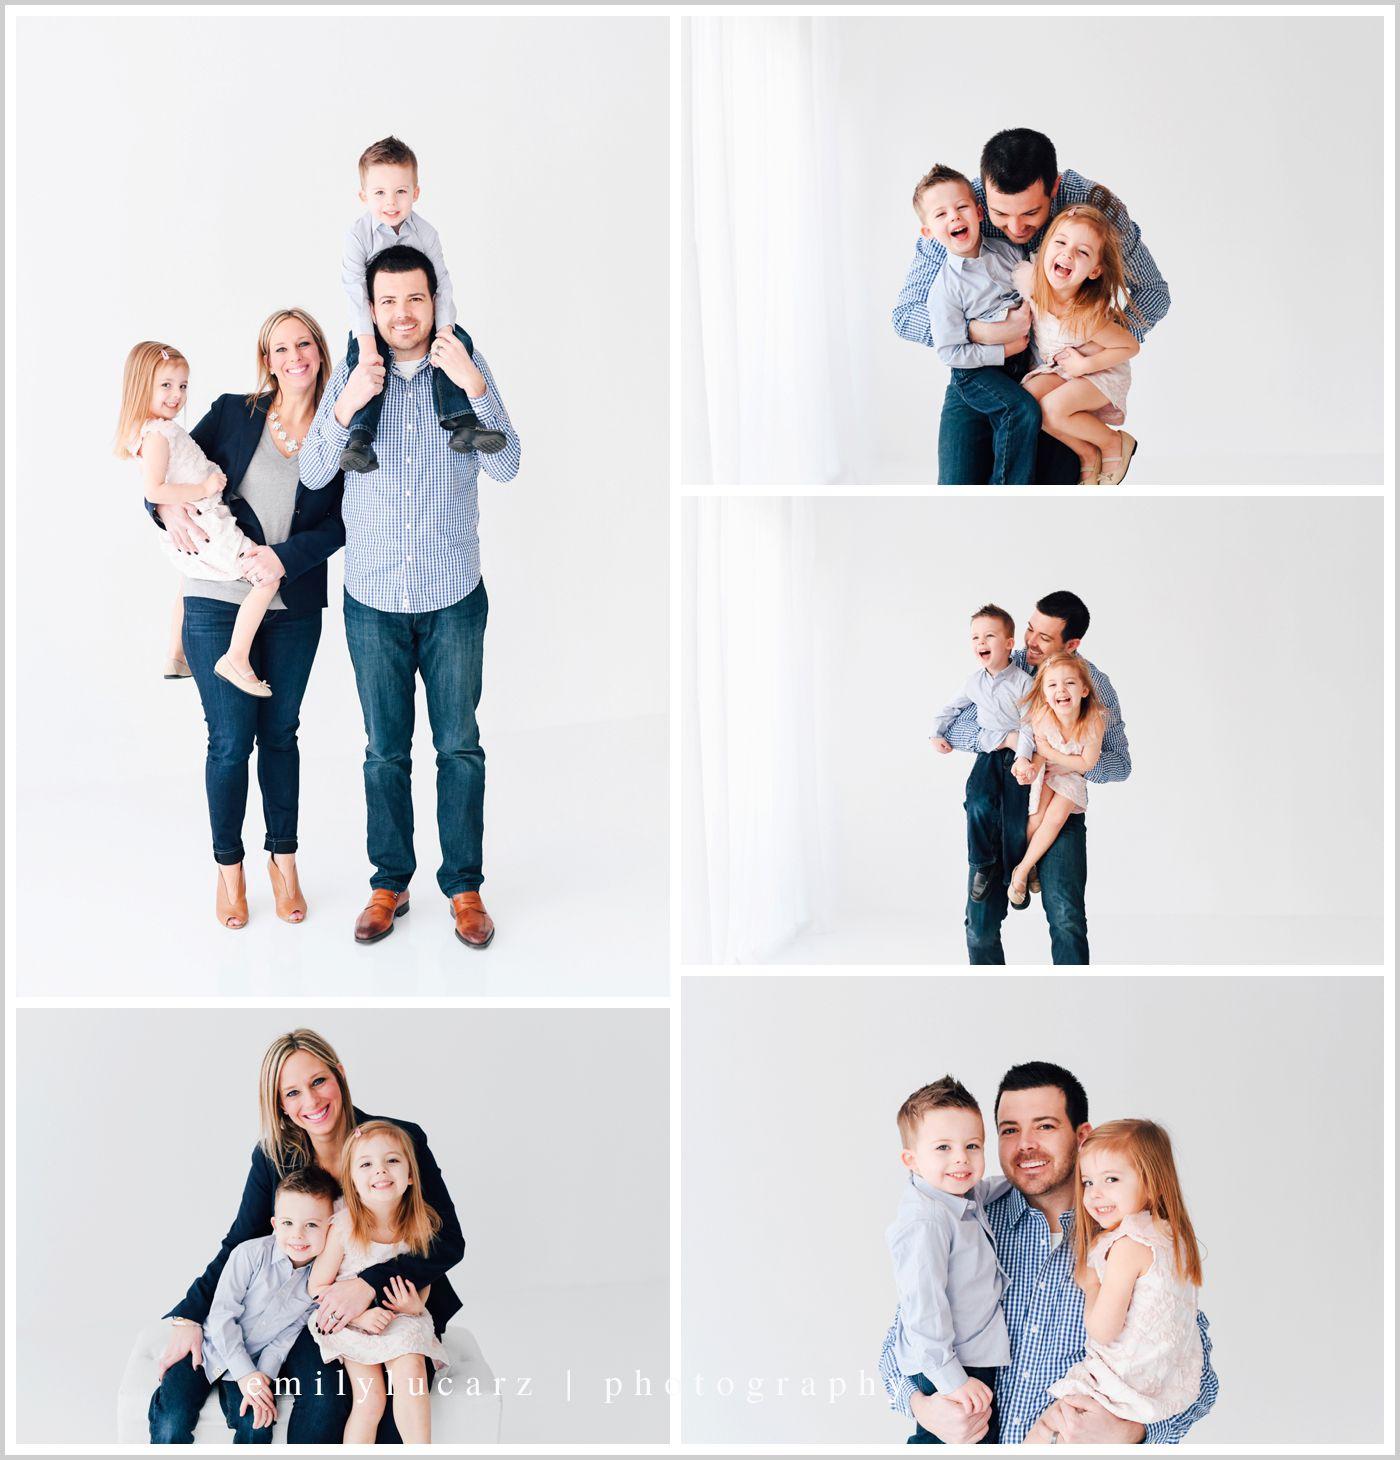 h family mini in studio emily lucarz family photography